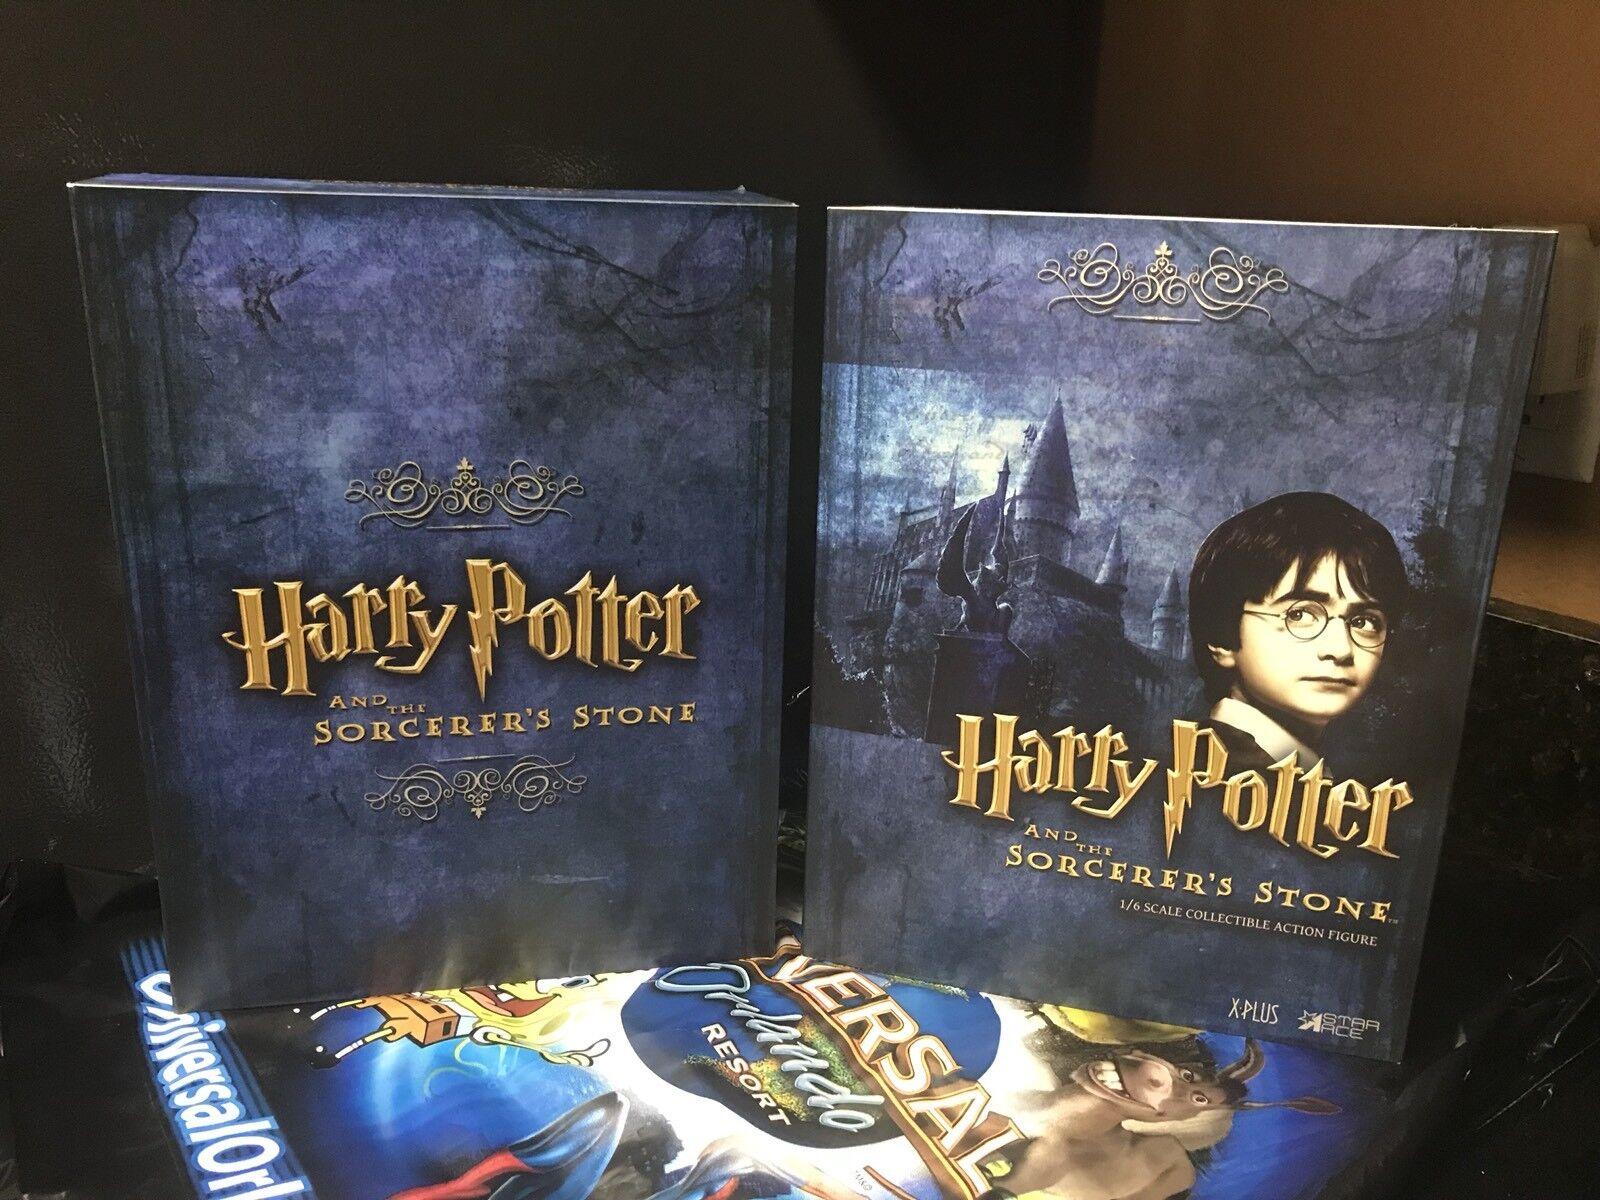 1 6 Star Ace Toys SA0001 Harry Potter Daniel Radcliffe Action FiGure CELEBRATION